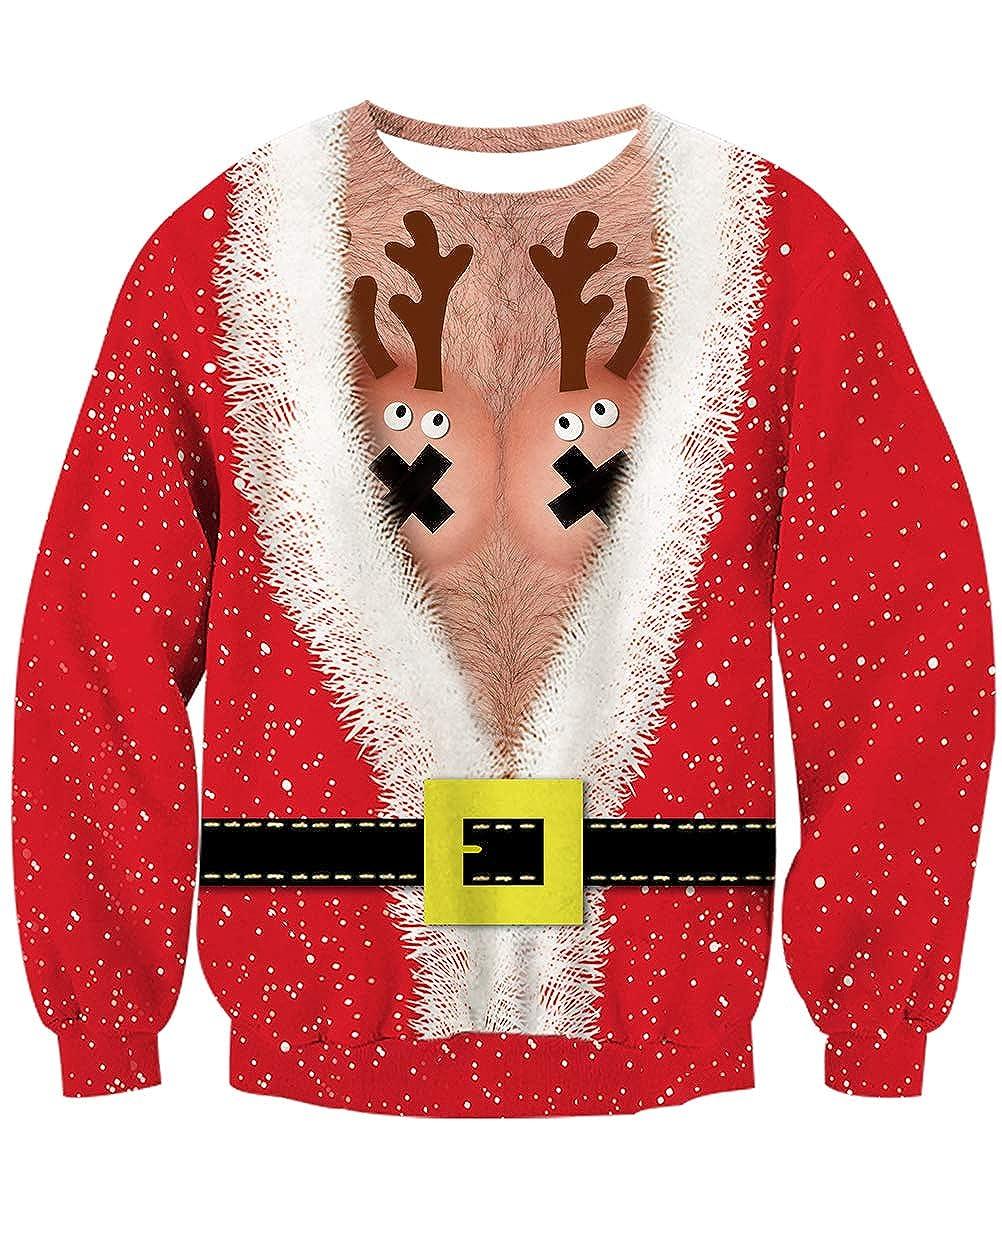 NEWISTAR Sweat Unisexe Homme Femme Pull de No/ël Santa Impression S-XXL